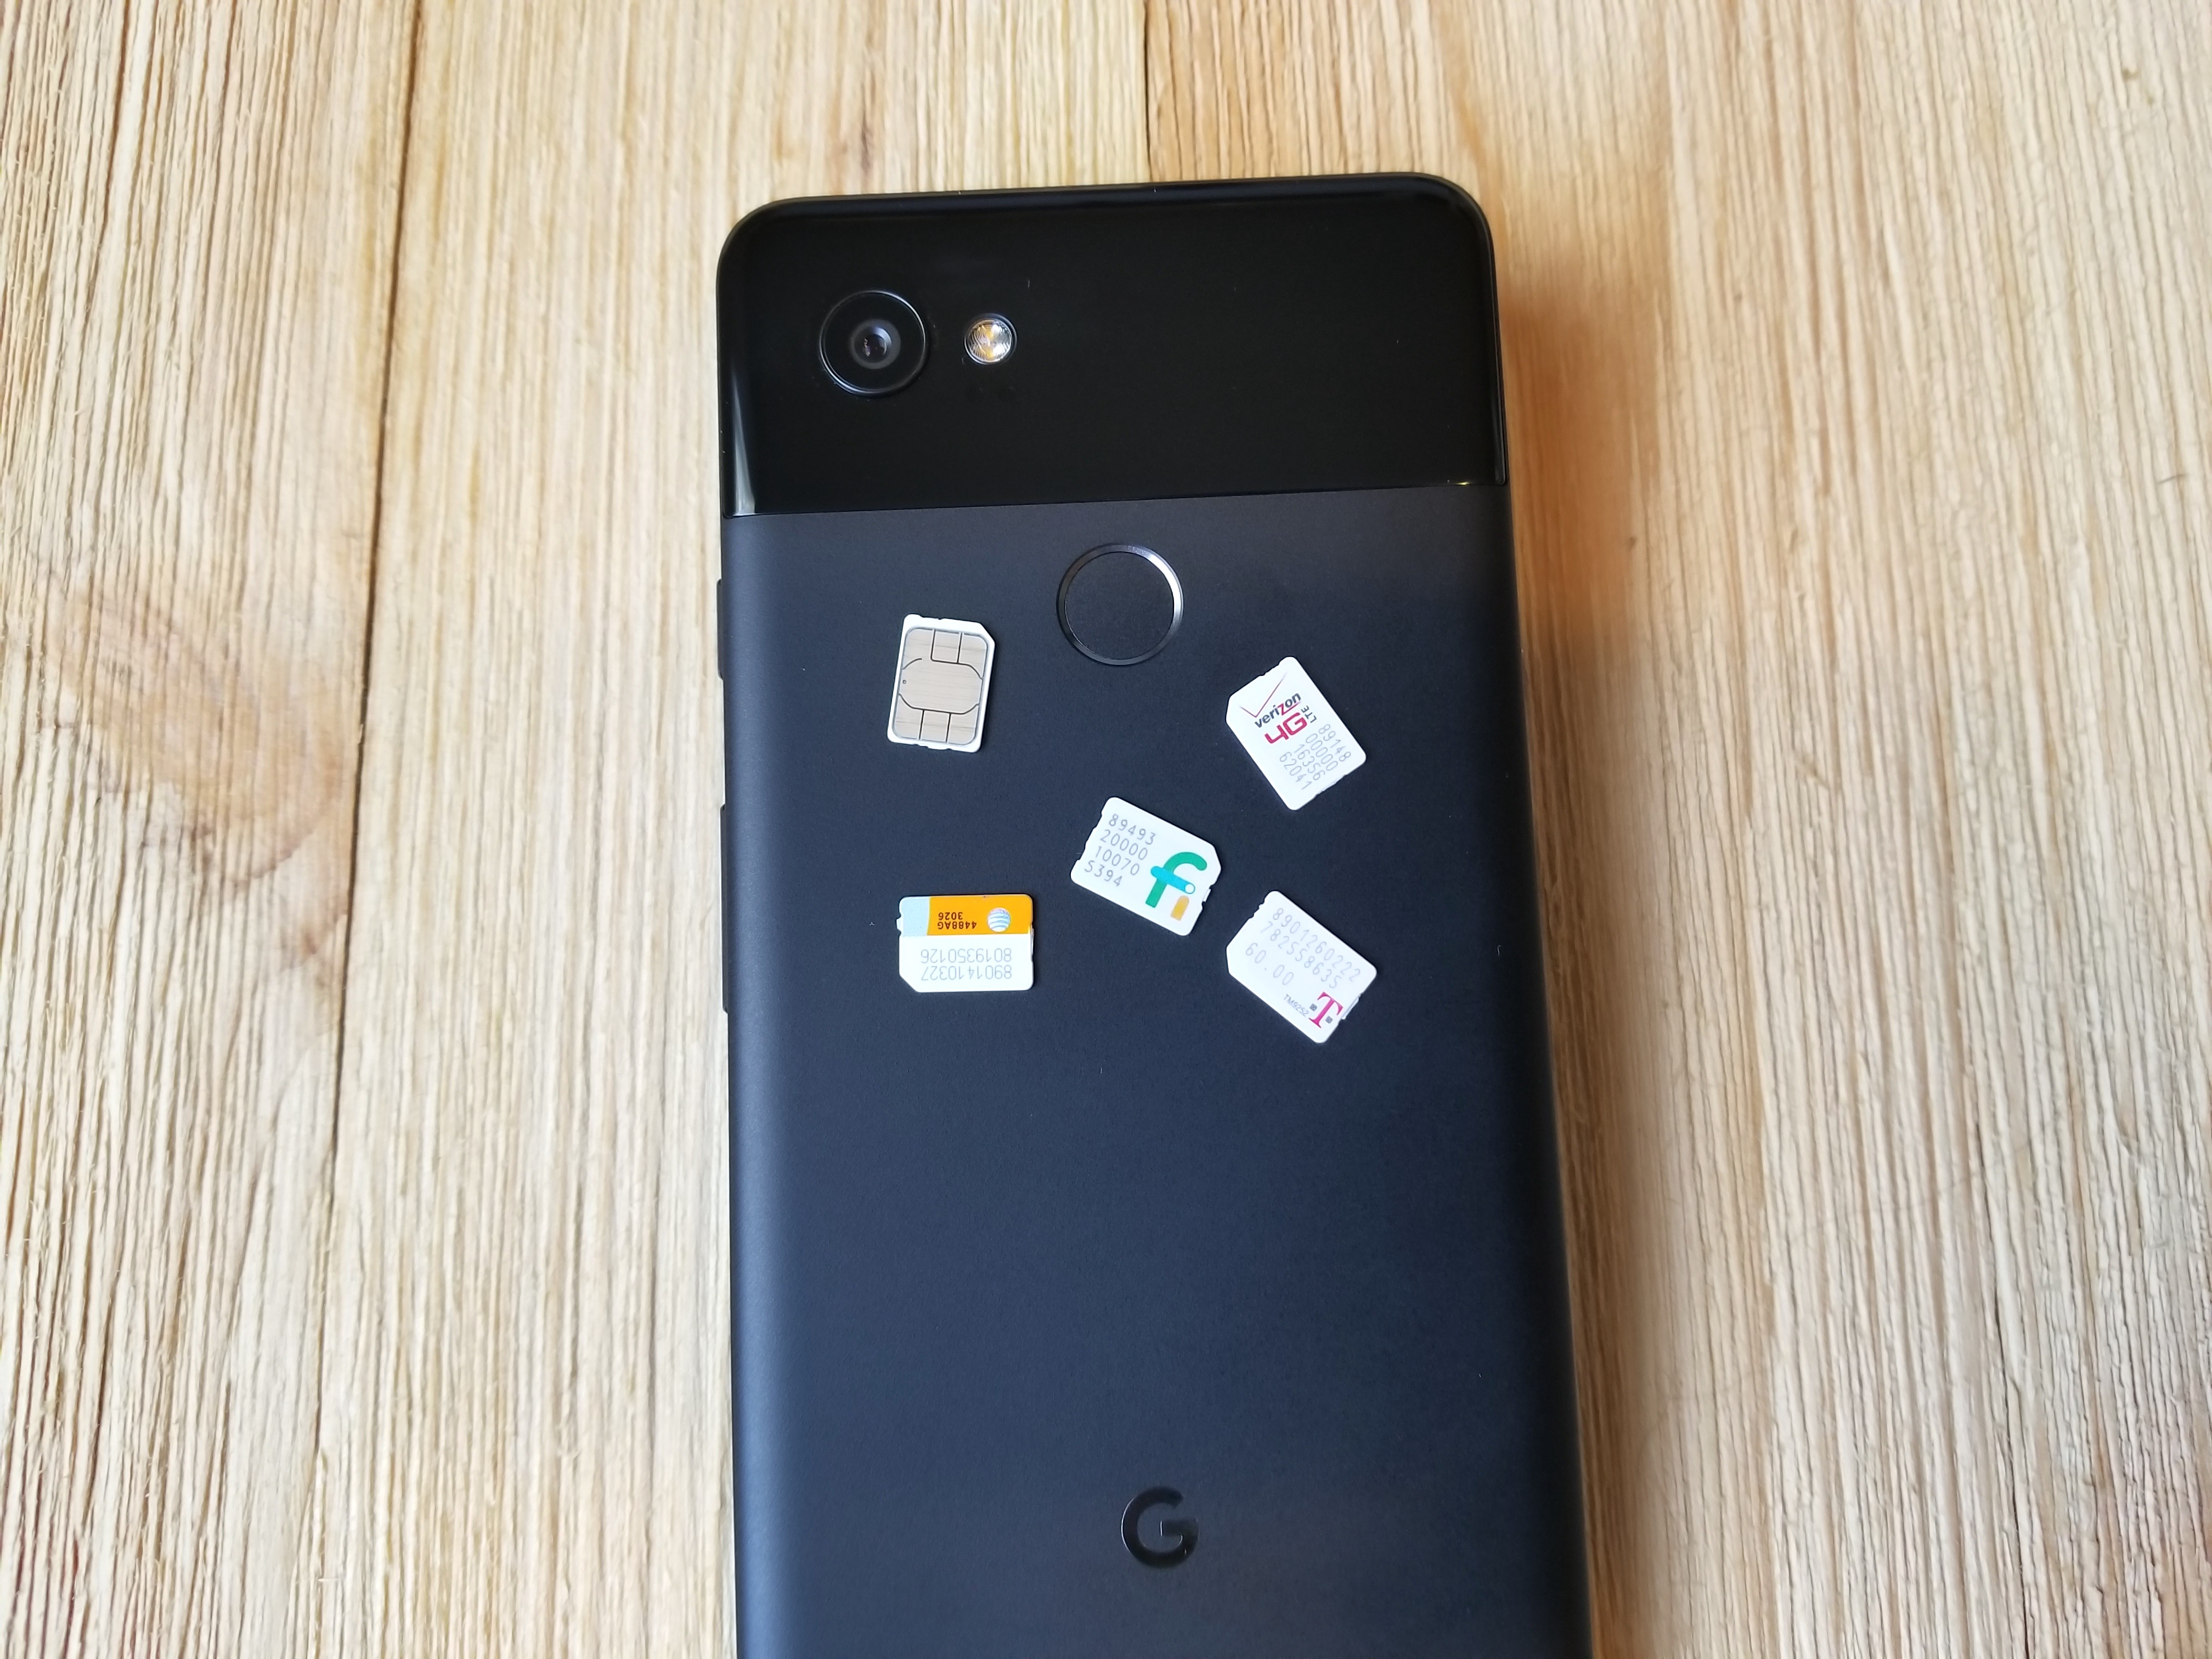 How to Change the Google Pixel 2 APN Settings